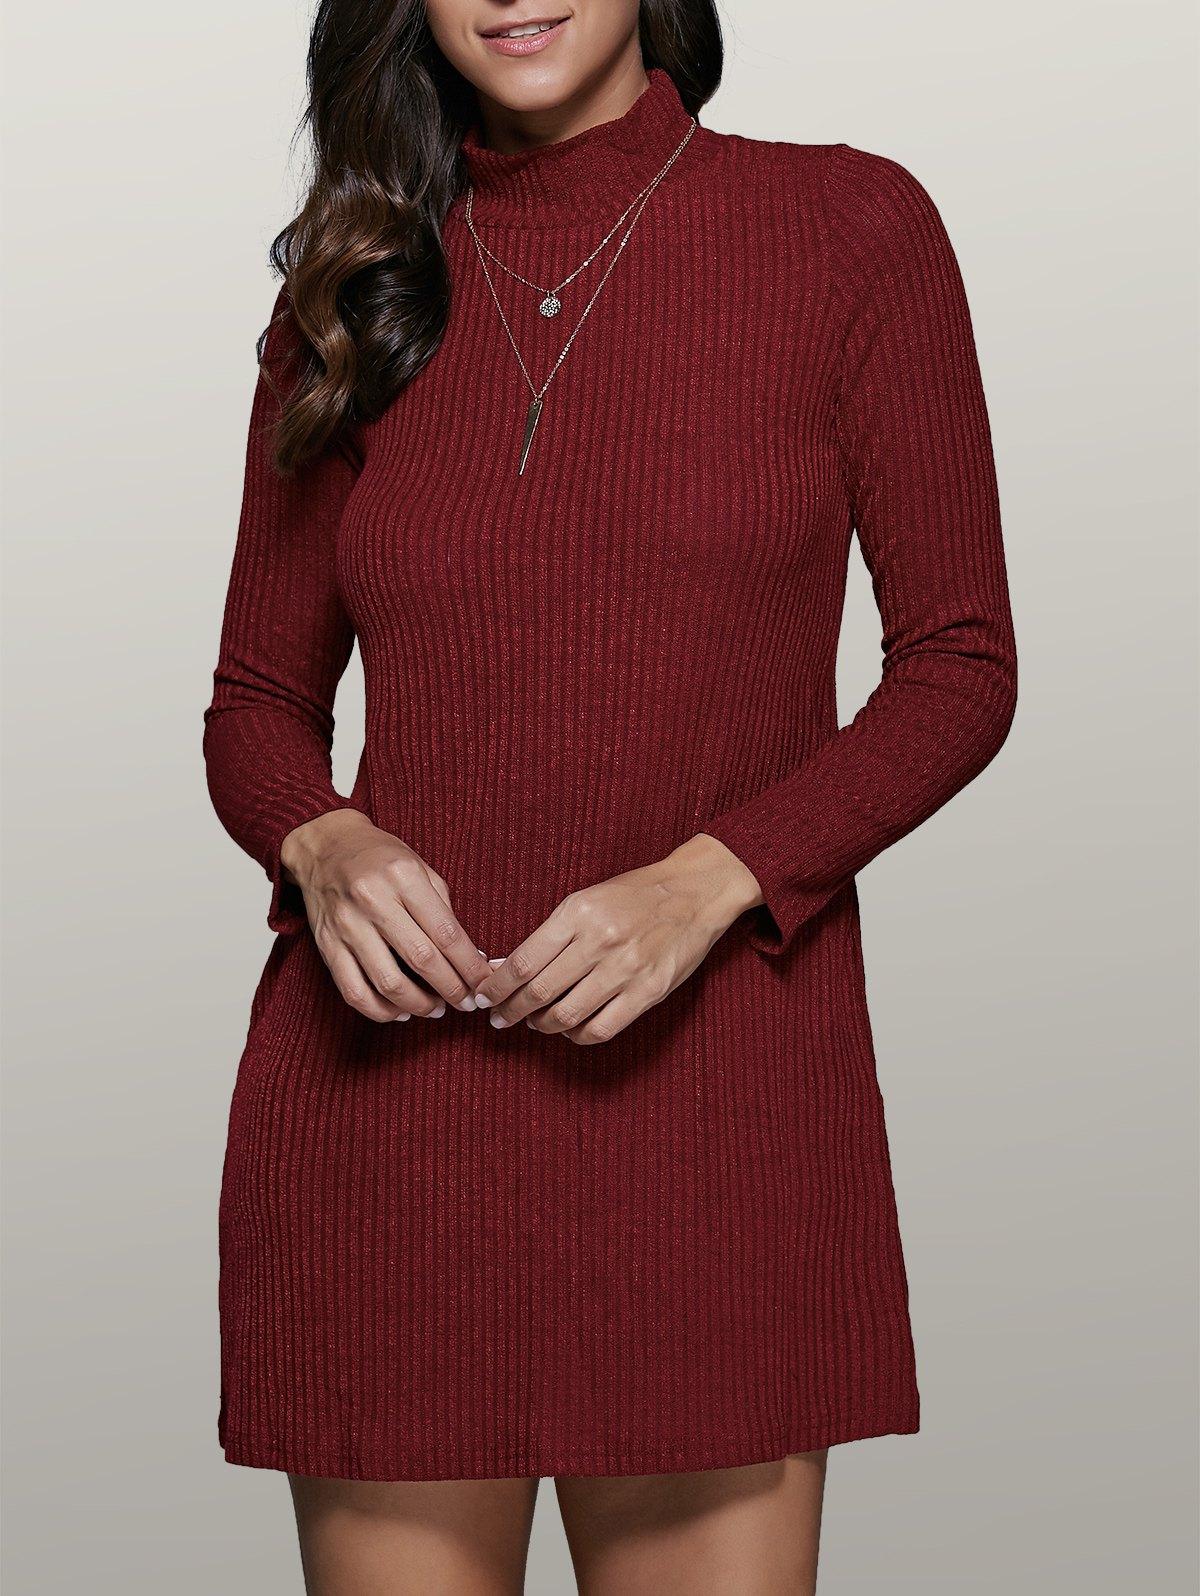 Mini A Line Long Sleeve Sweater Dress - WINE RED XL